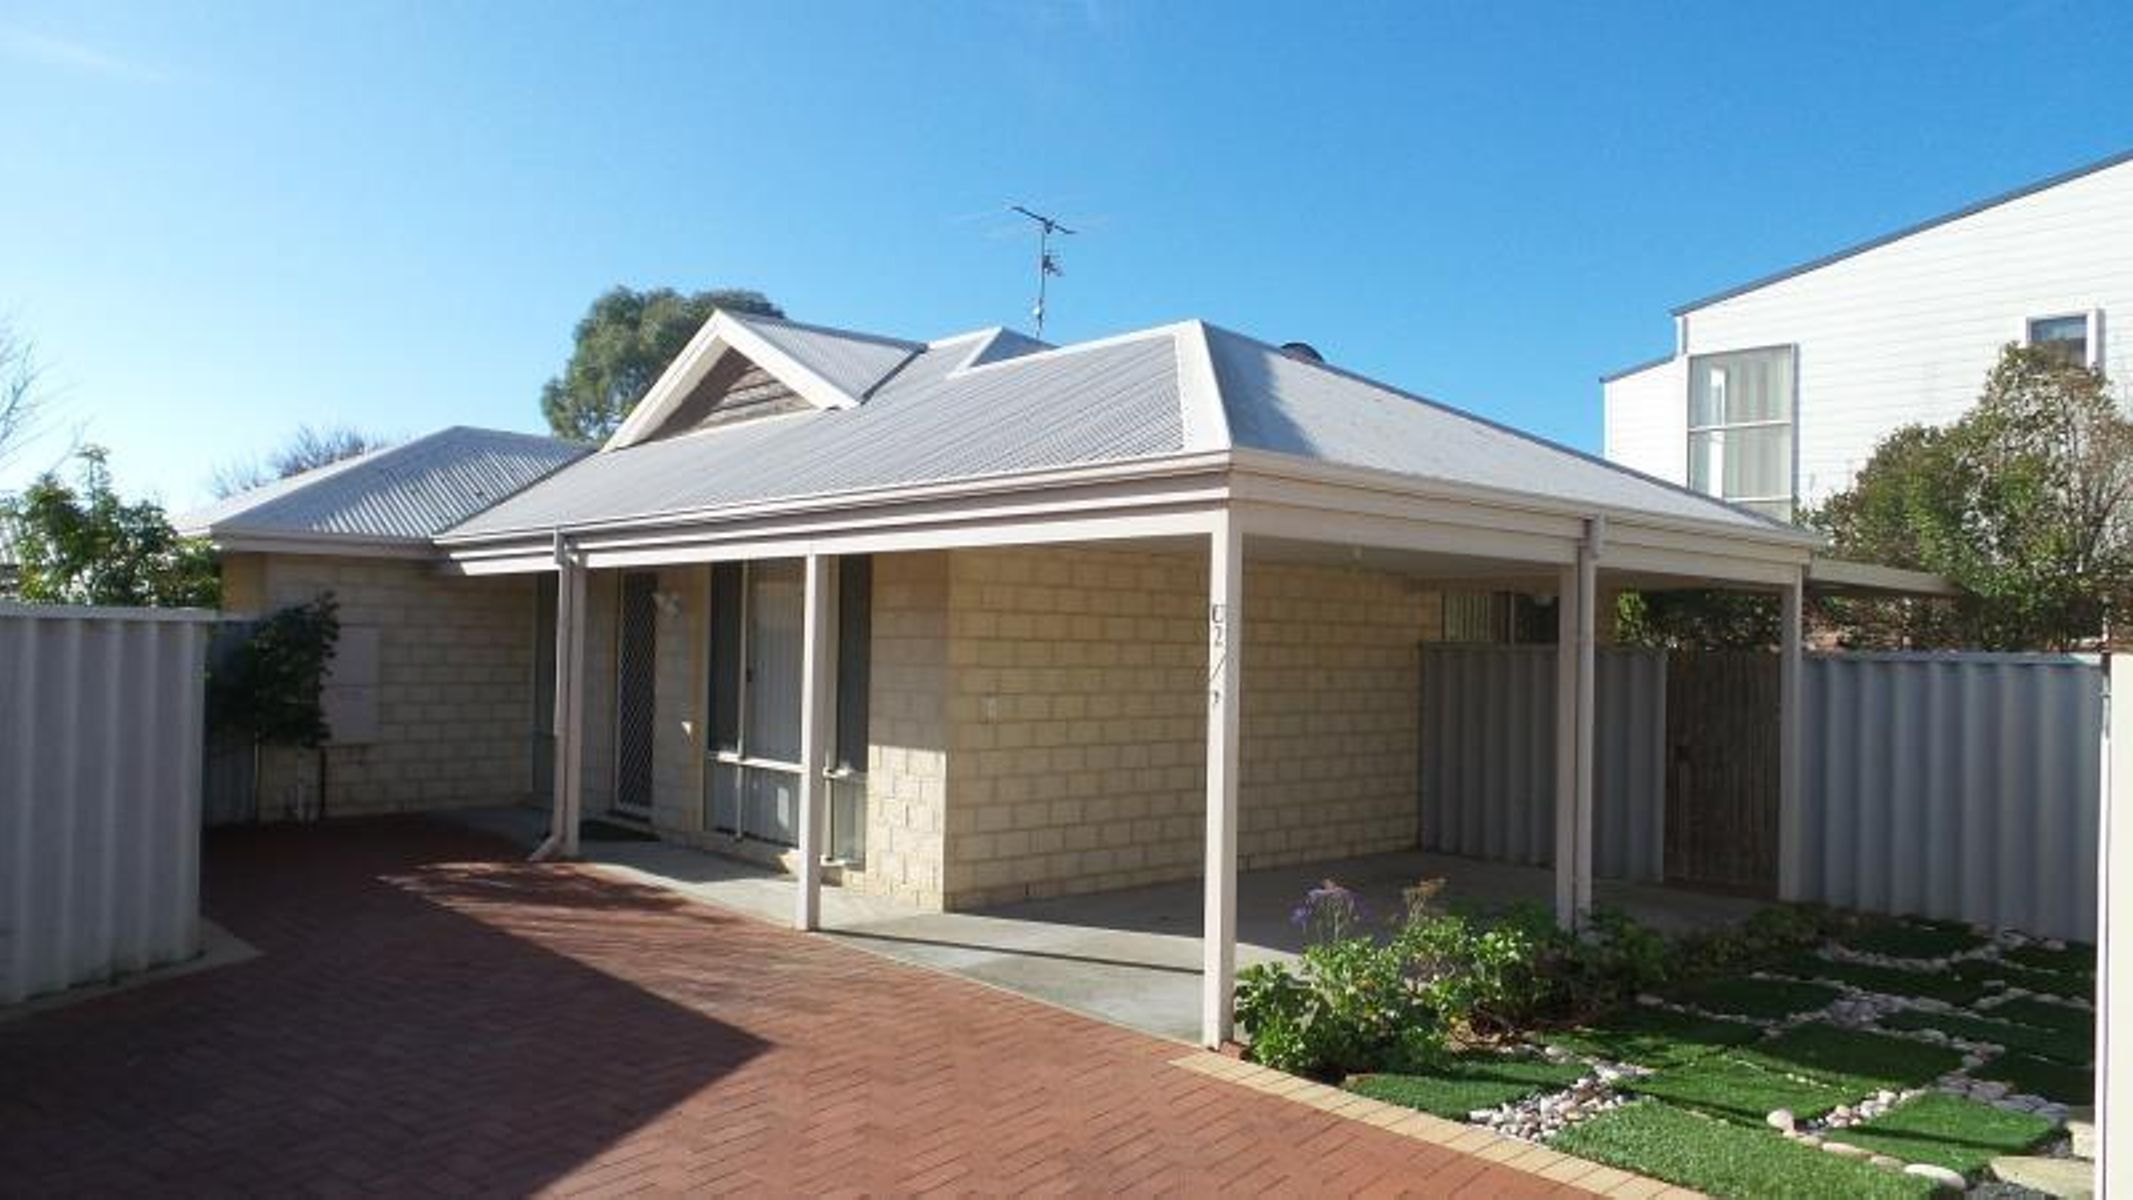 2/20 Frankland Way, West Busselton WA 6280, Australia, House